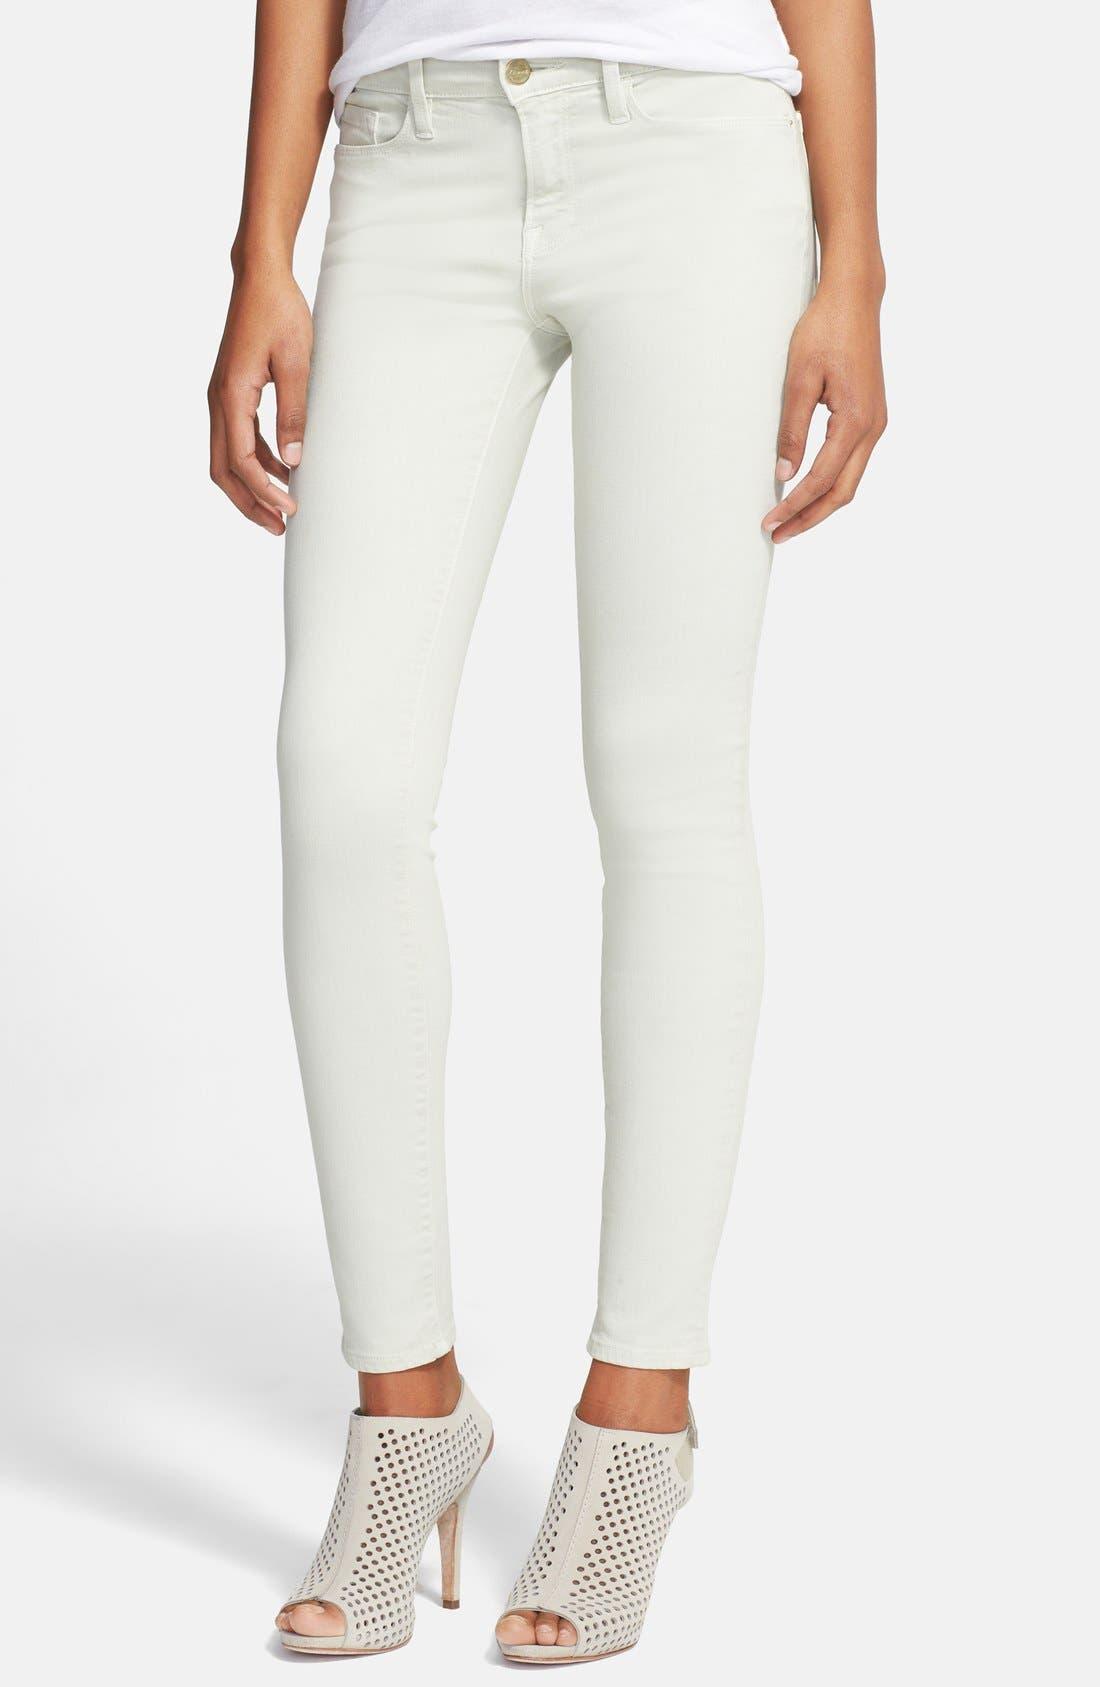 Main Image - FRAME 'Le Color' Skinny Jeans (Pale Mint)